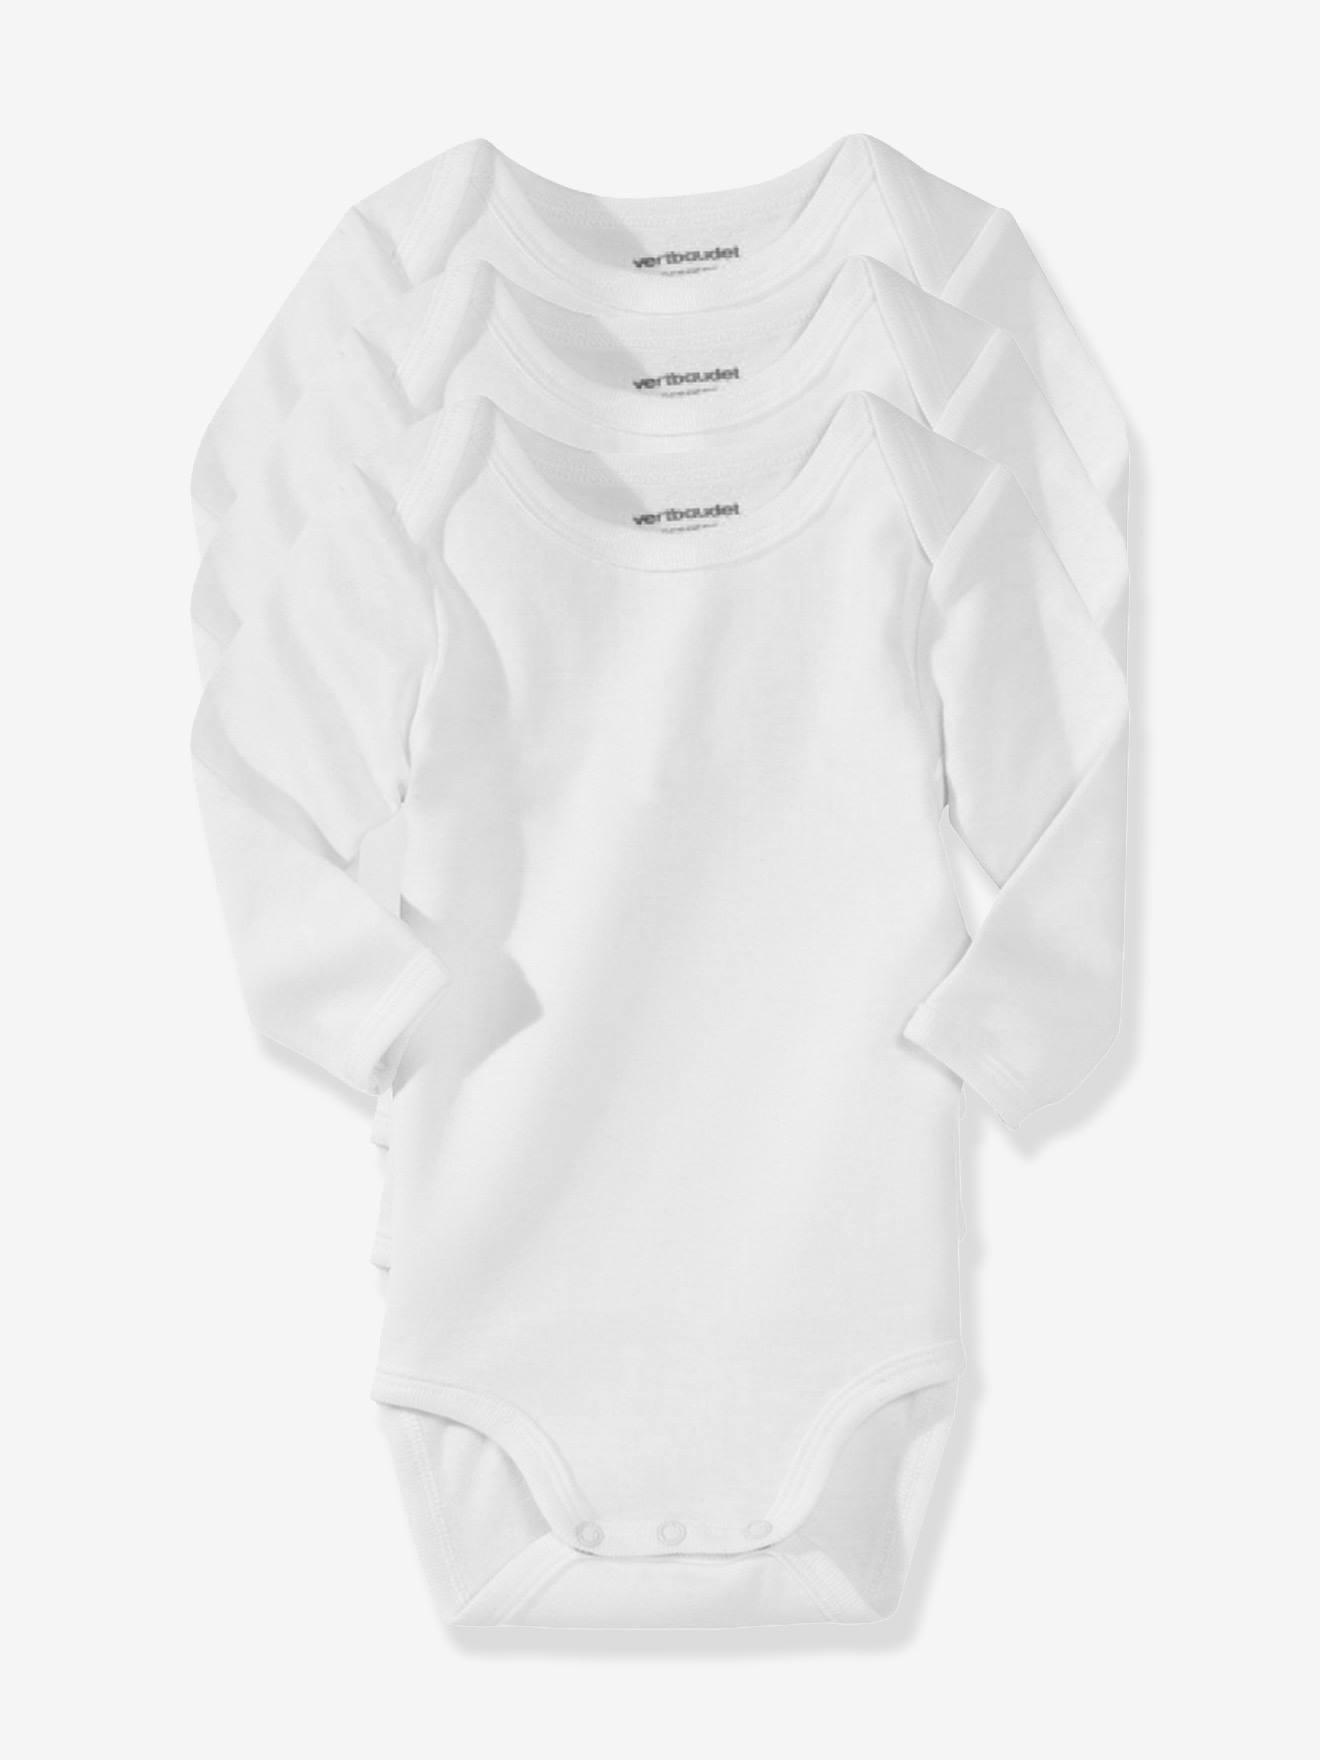 VERTBAUDET Lote de 3 bodies blancos de manga larga 100/% algod/ón reci/én nacido Blanco 12M 74CM